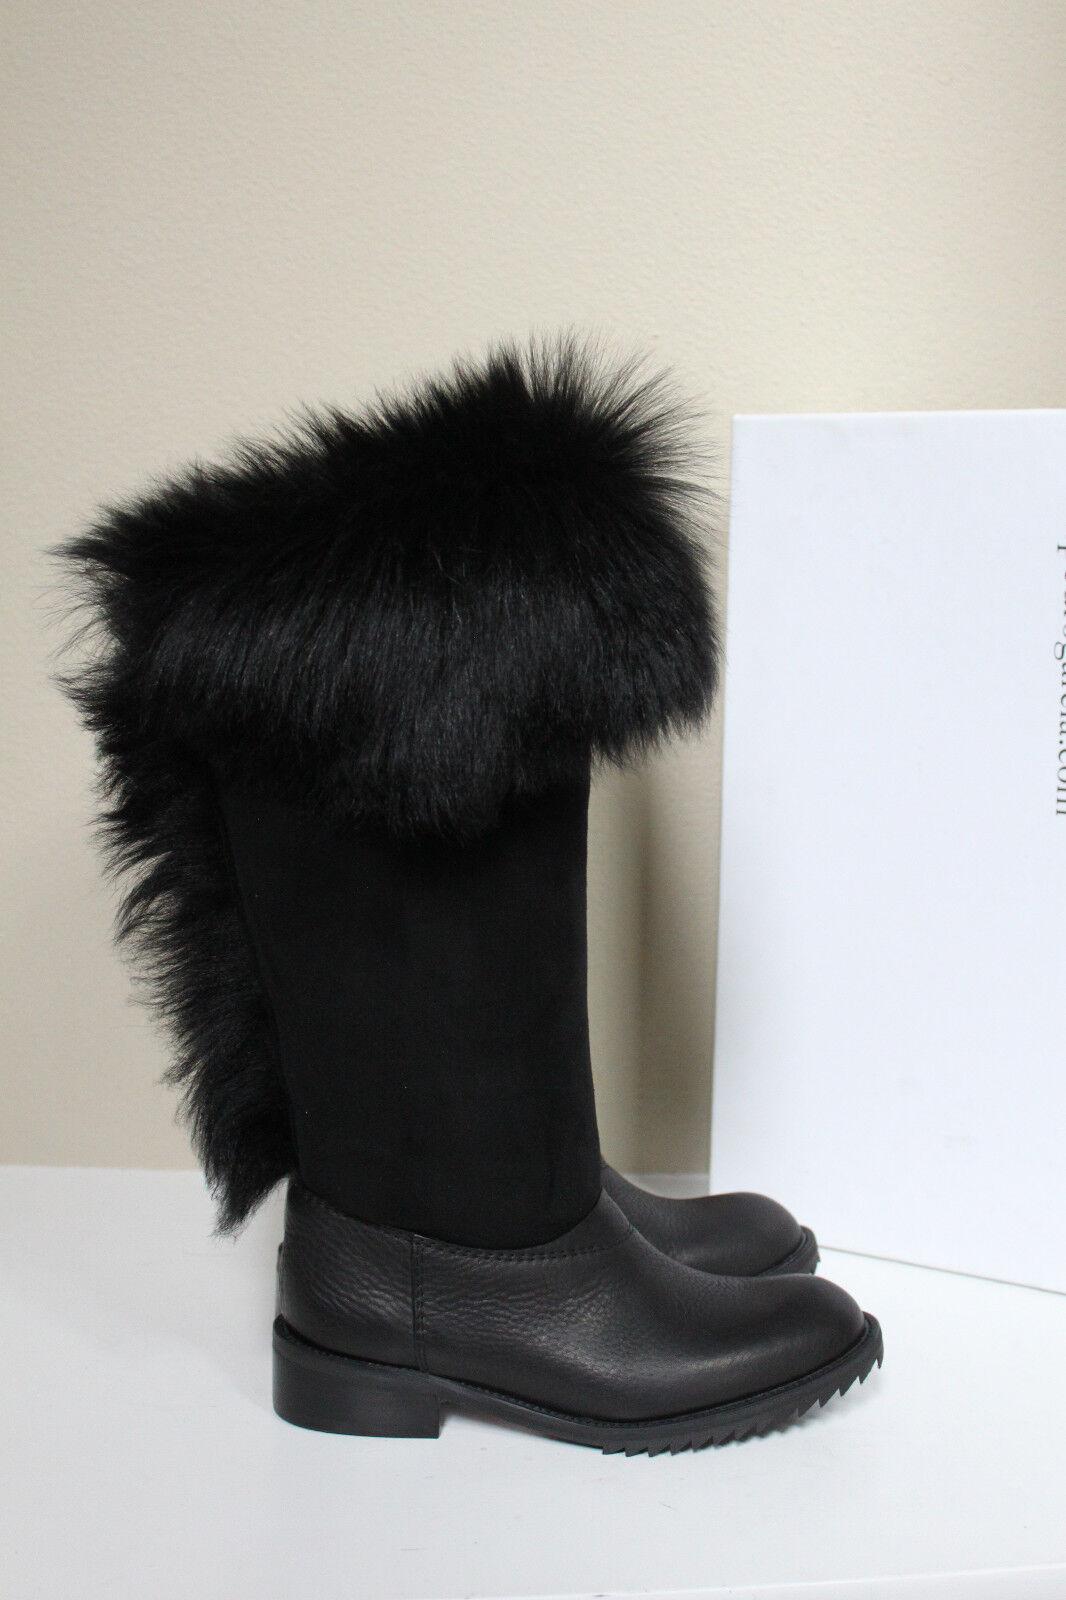 sz 6 / 36 Pedro Garcia Black Odette Genuine Shearling & Leather Boot Shoes